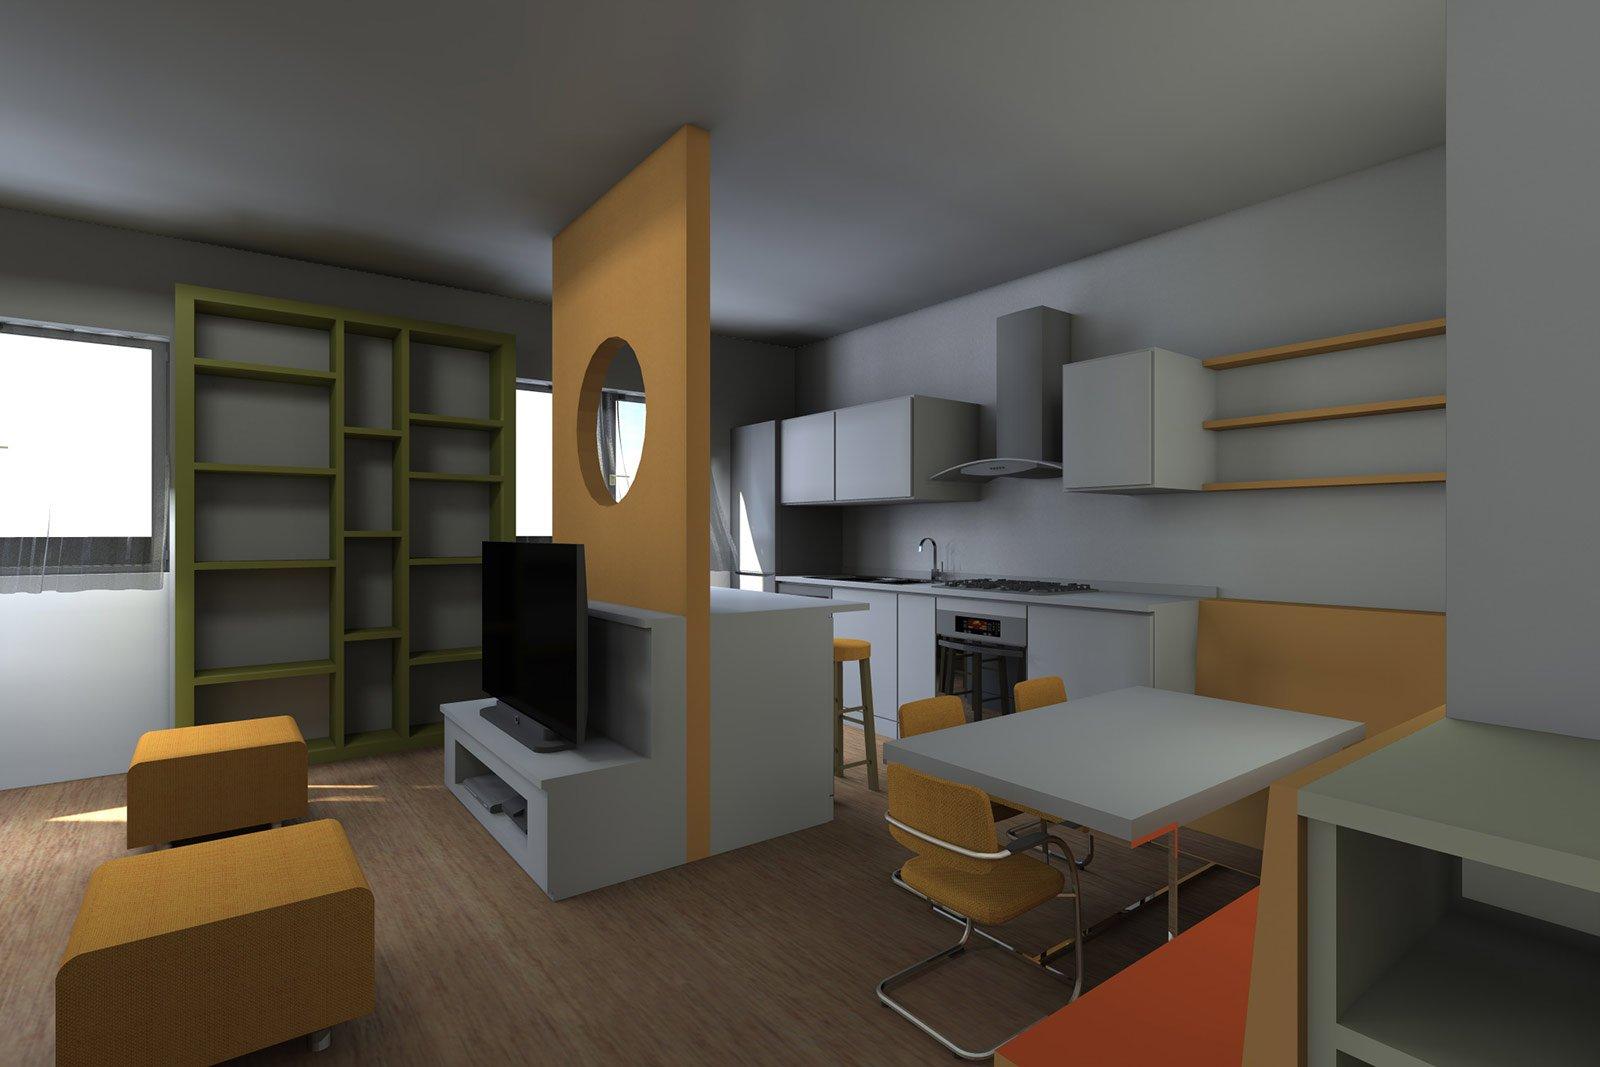 Arredare soggiorno con cucina a vista kt83 pineglen - Cucina con vetrata a vista ...